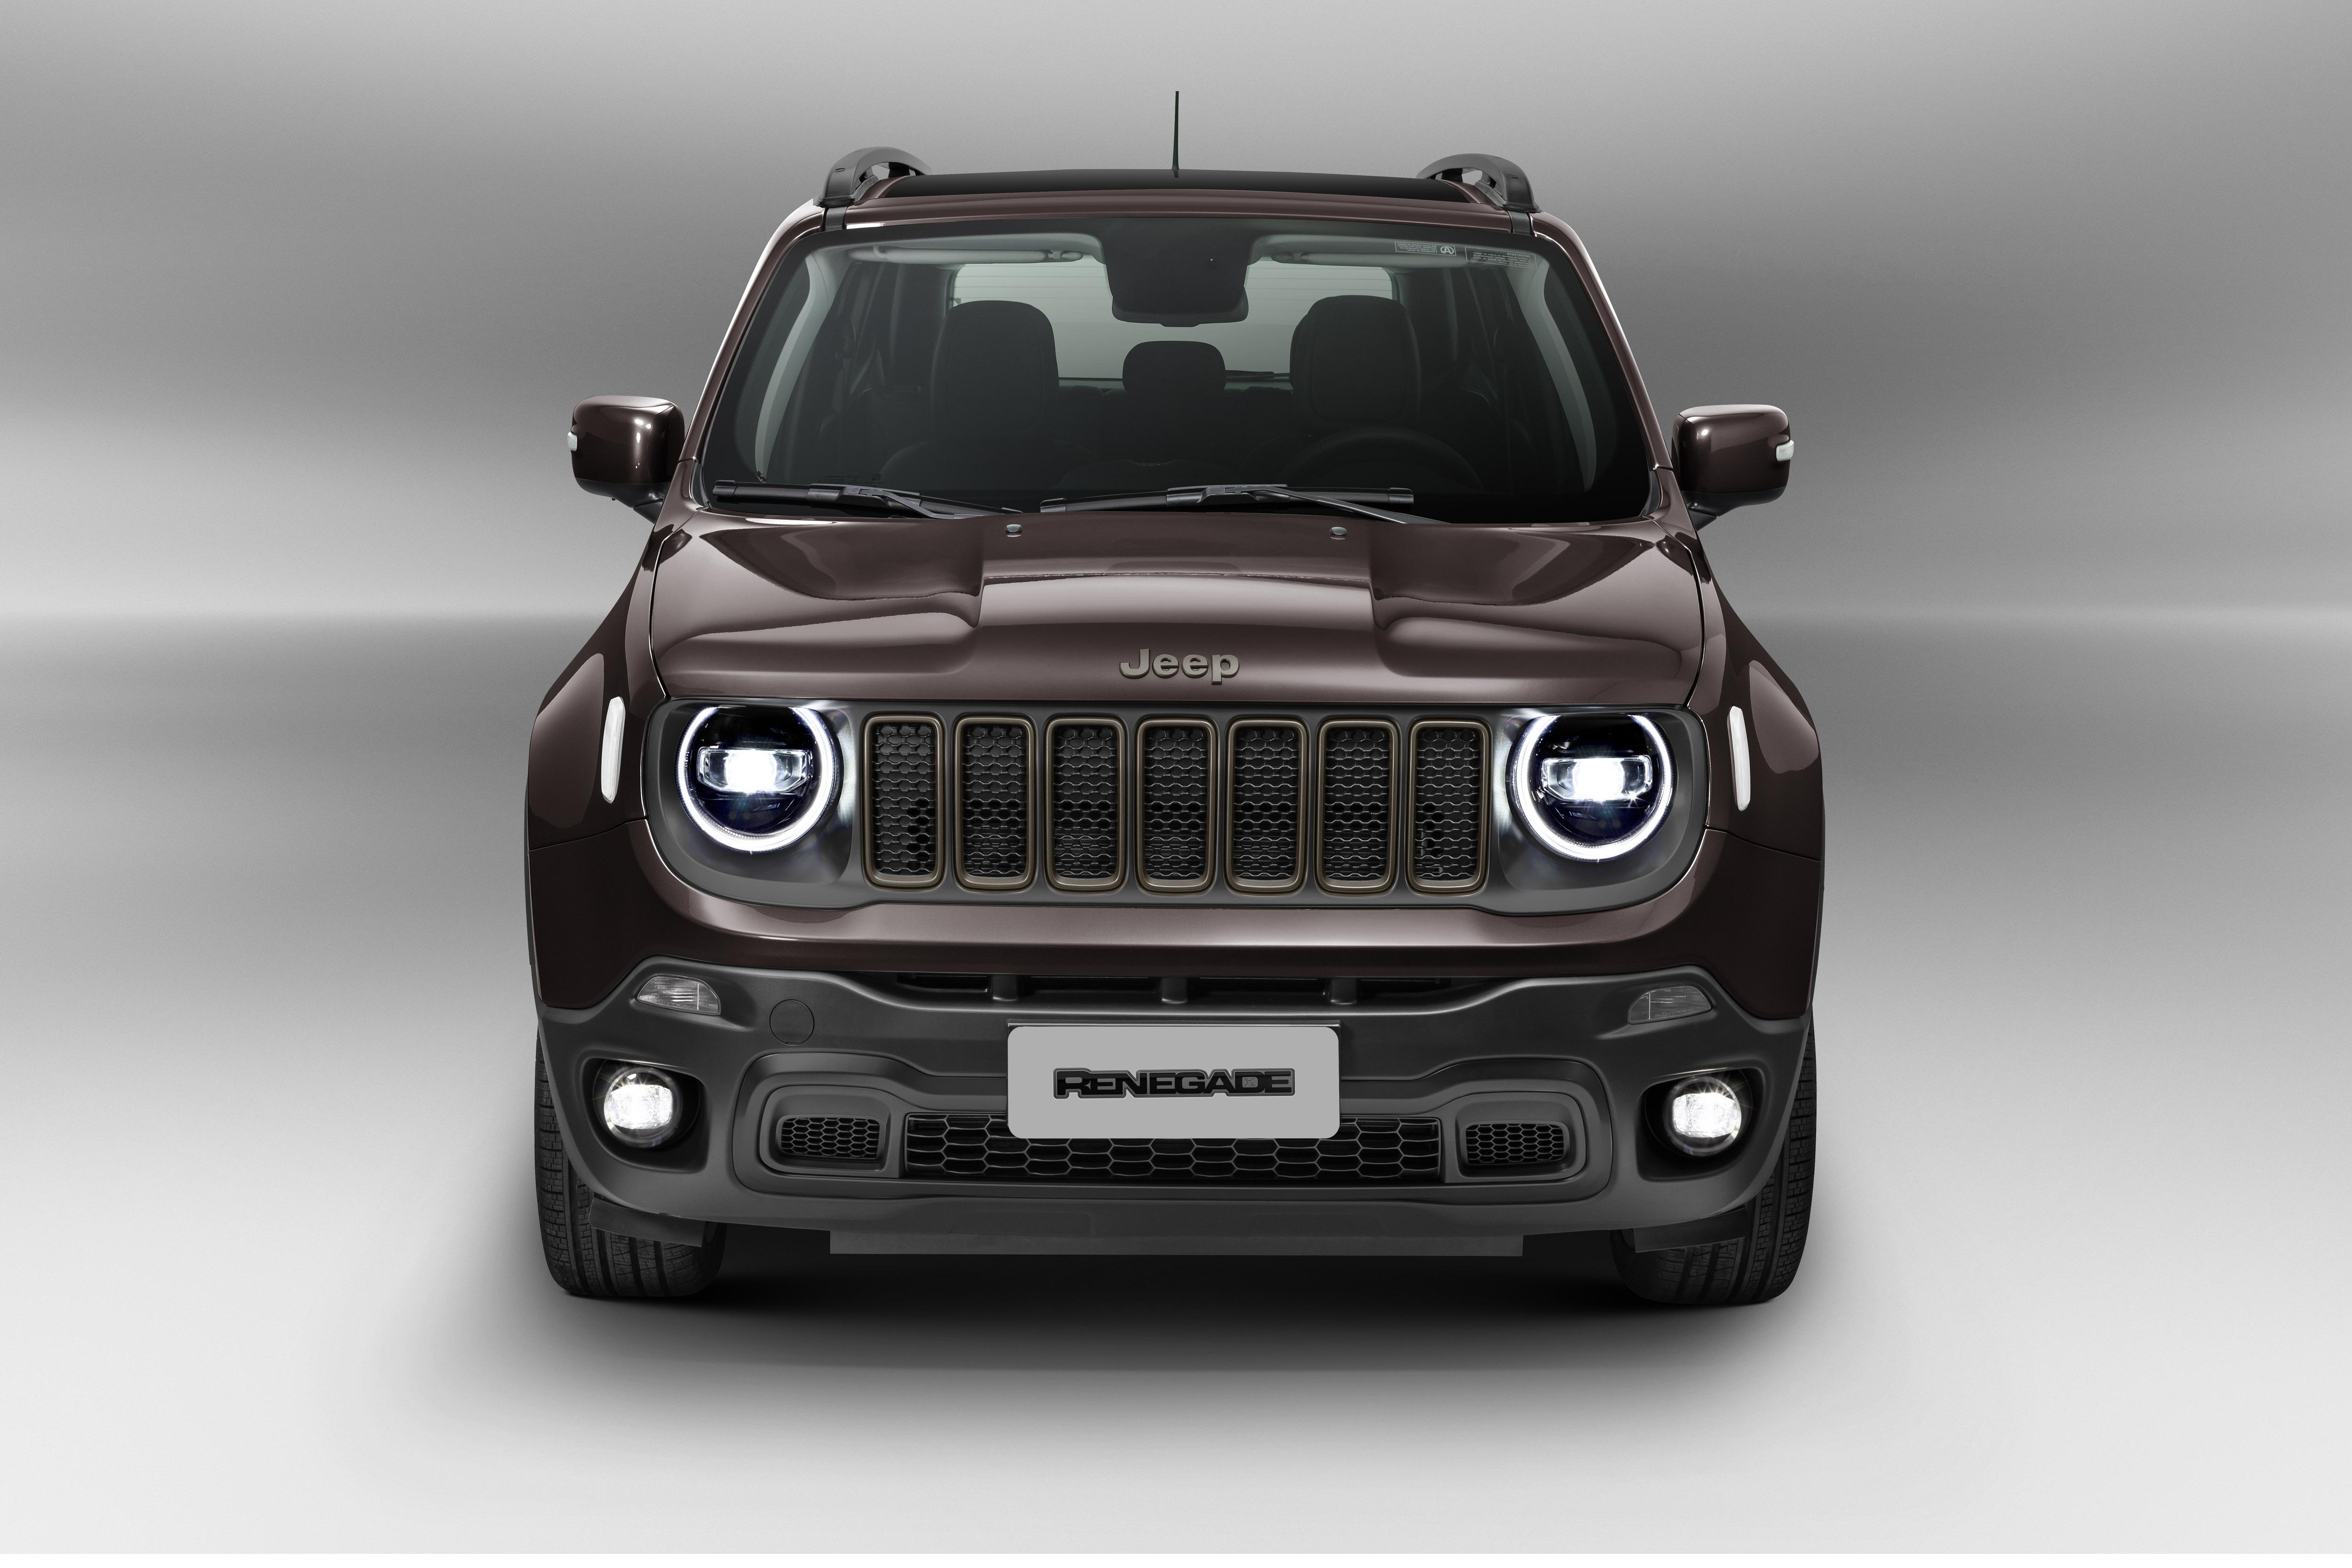 Brazilian Spec 2019 Jeep Renegade Makes Its Debut Mopar Insiders